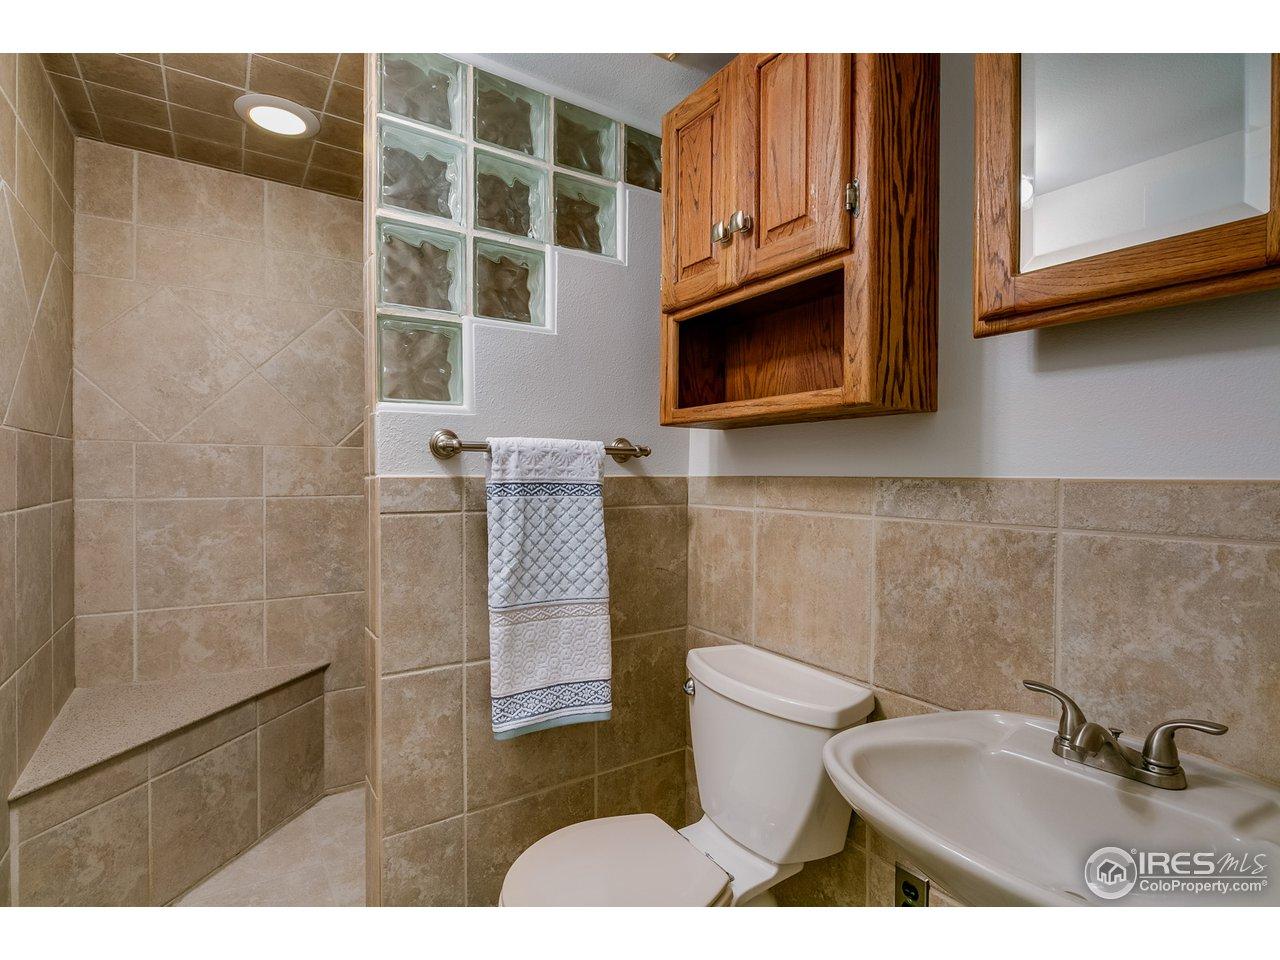 Nicely Updated Basement Bathroom